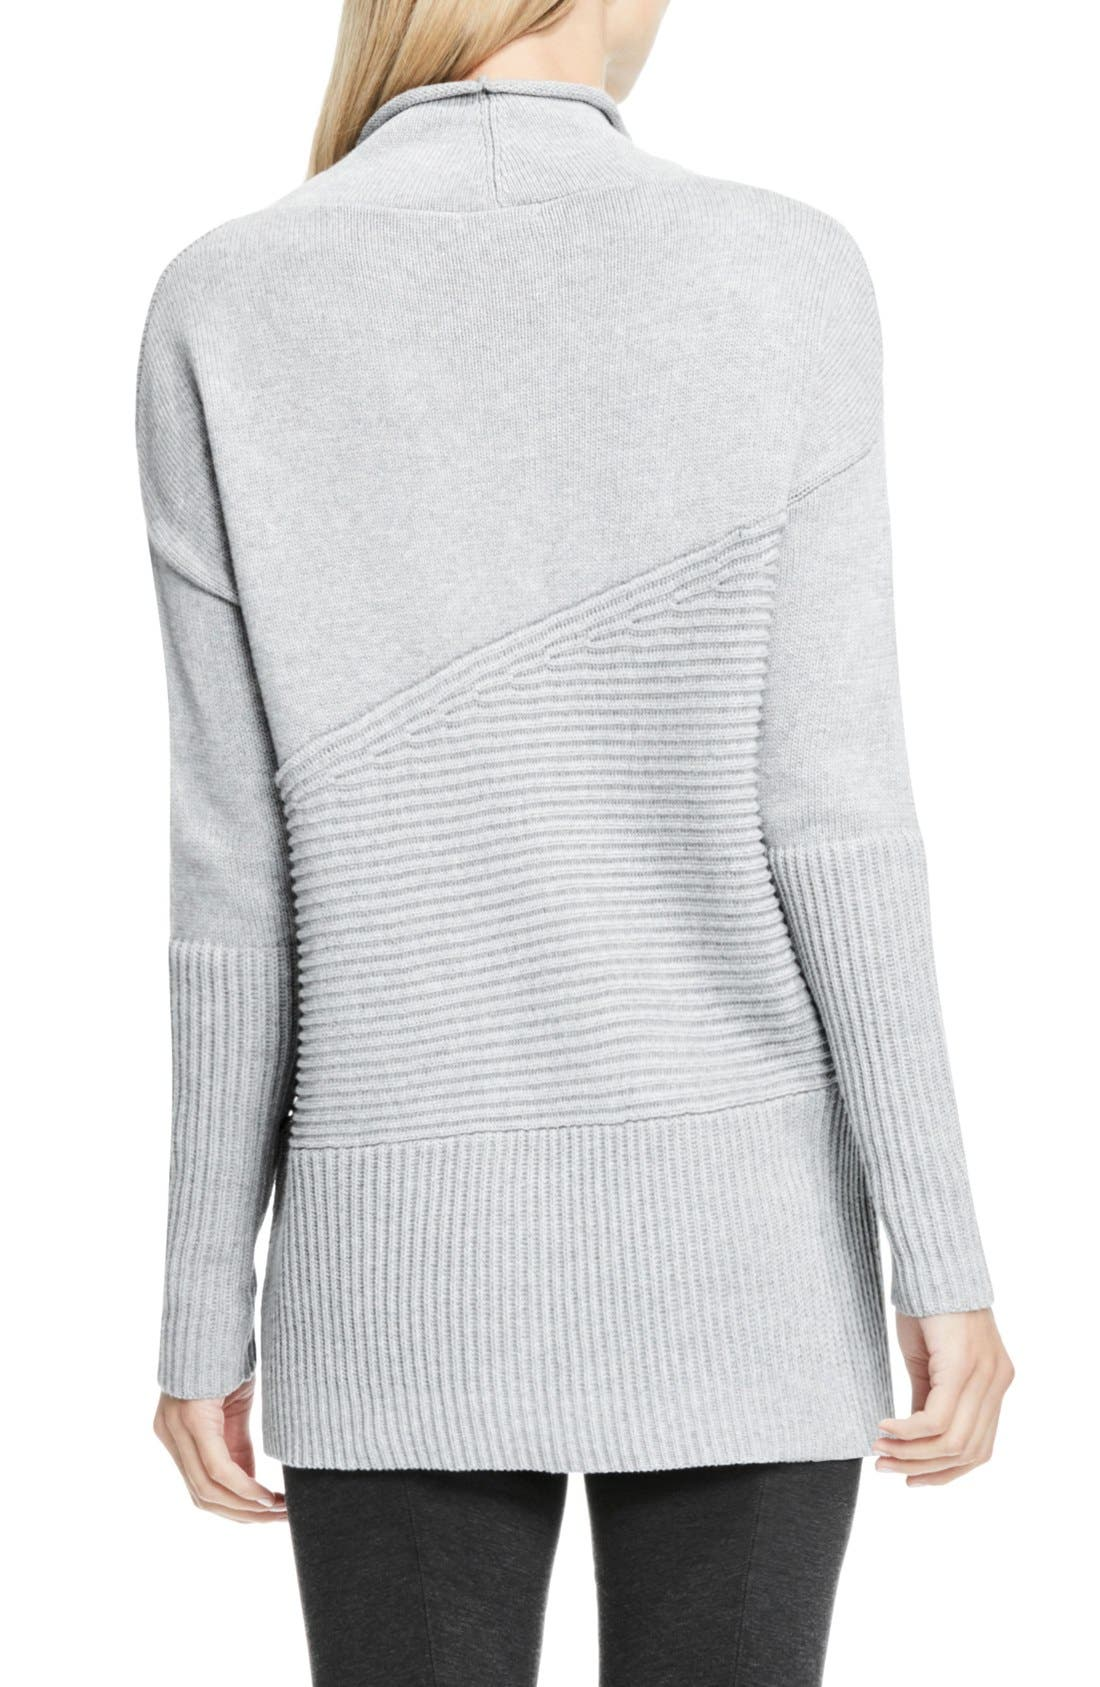 Alternate Image 3  - Vince Camuto Rib Knit Turtleneck Sweater (Regular & Petite)